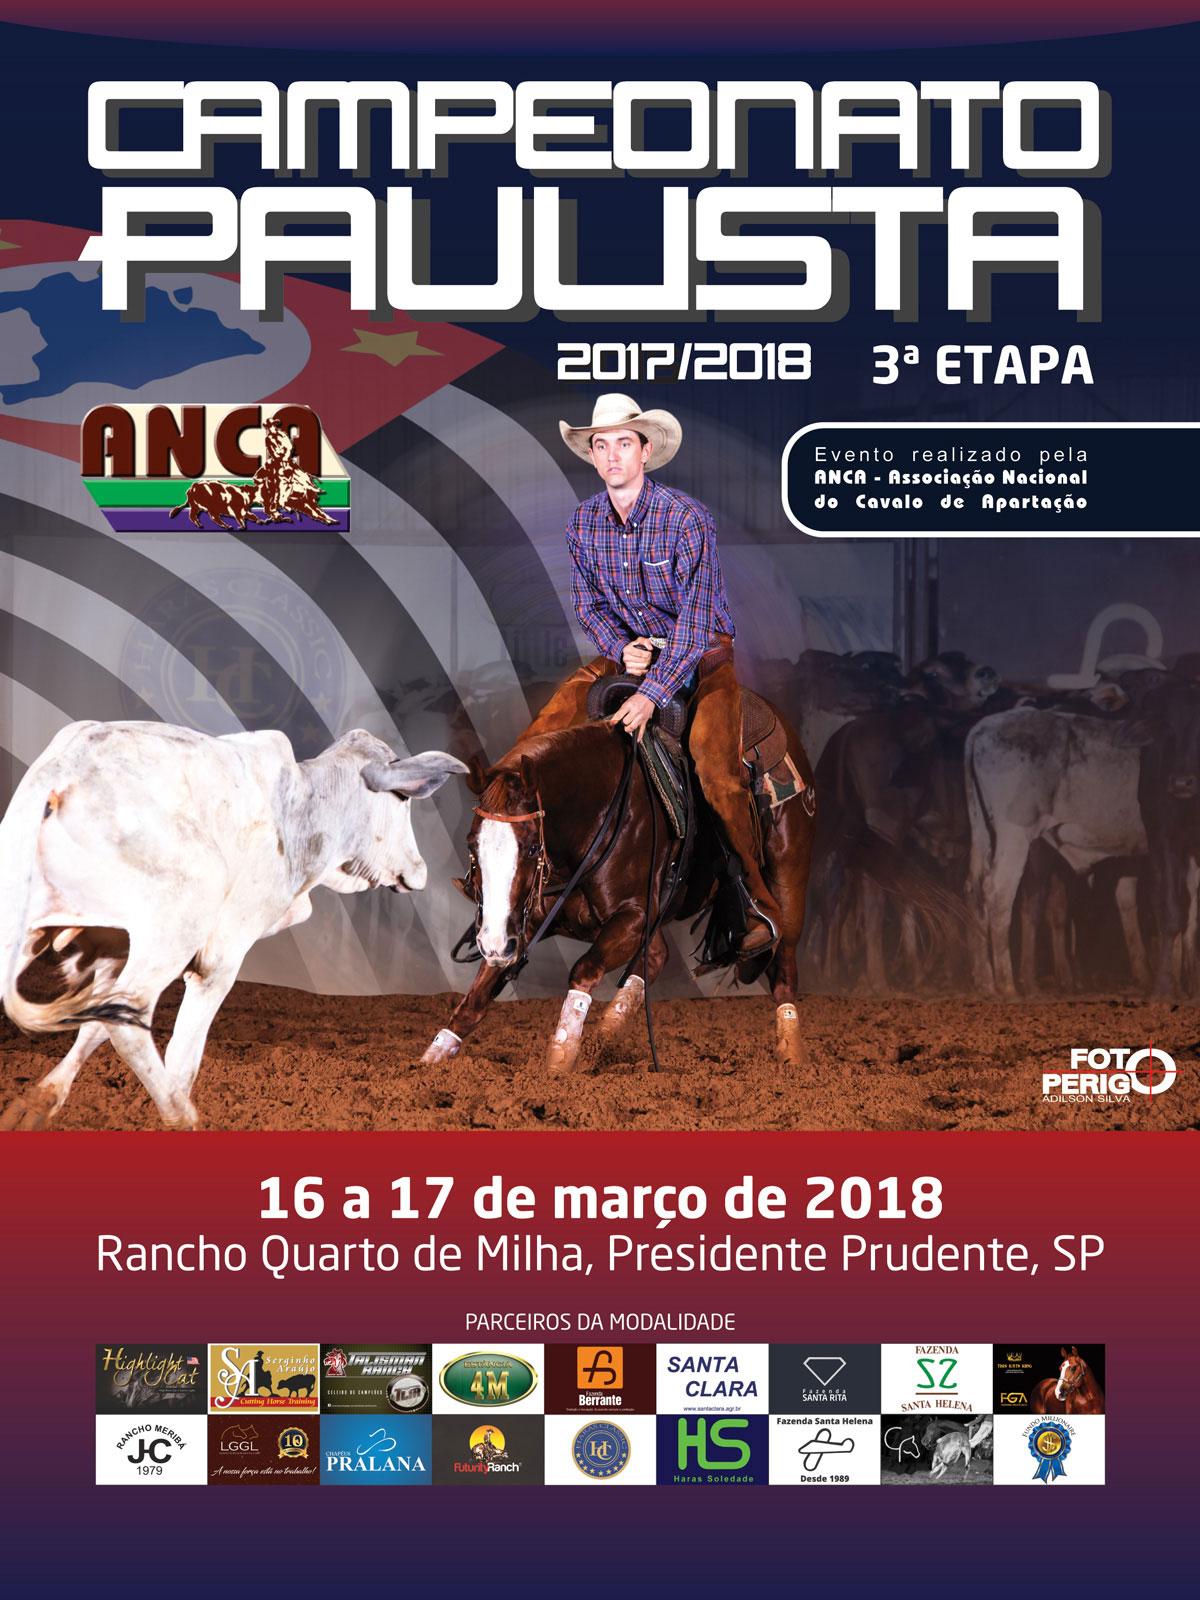 Campeonato Paulista ANCA 2017/2018 - 3ª Etapa